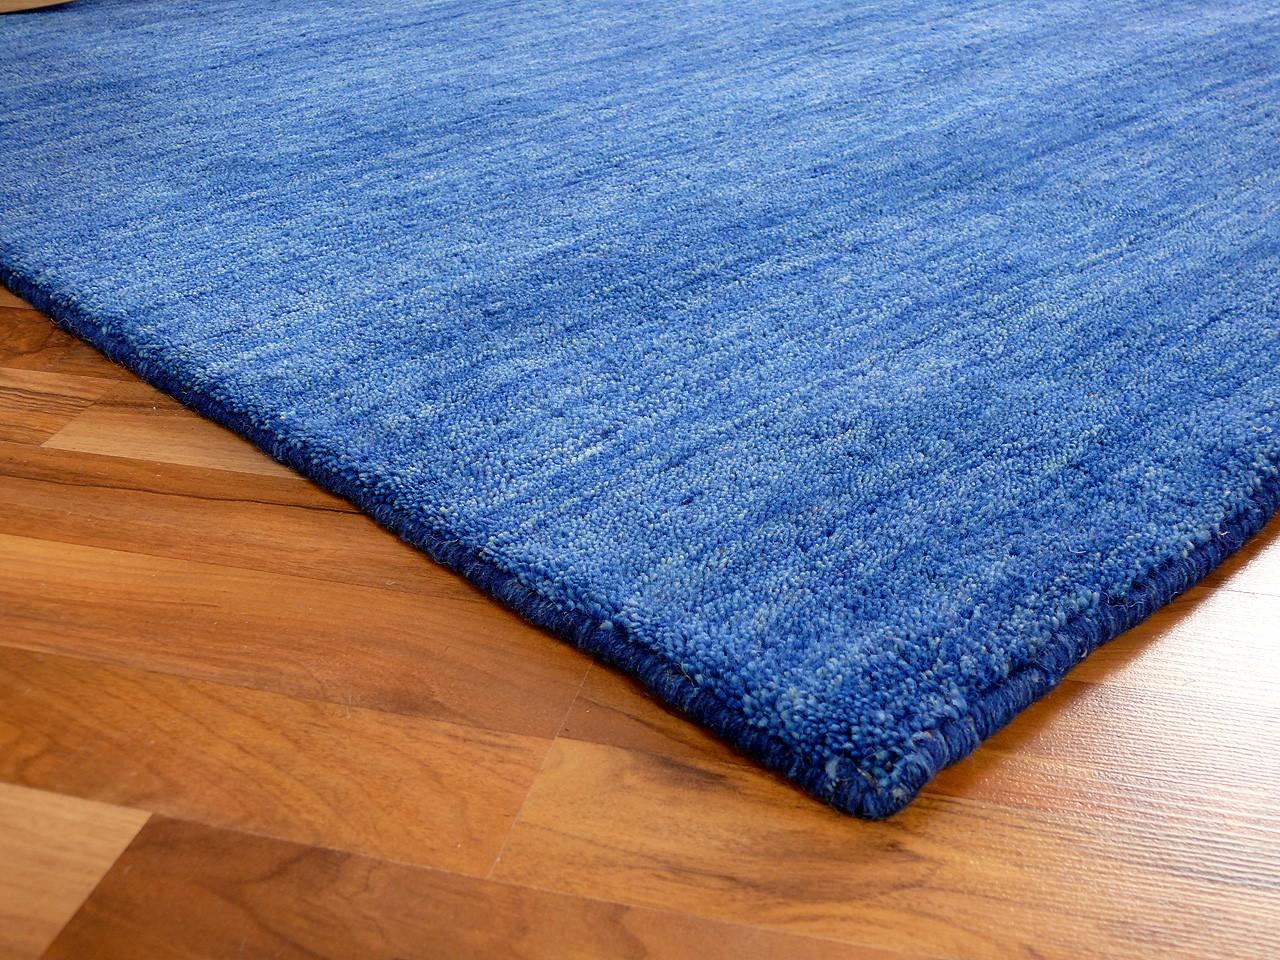 indo gabbeh teppich shiva blau uni teppiche nepal gabbeh und kelim teppiche indo gabbeh teppiche. Black Bedroom Furniture Sets. Home Design Ideas